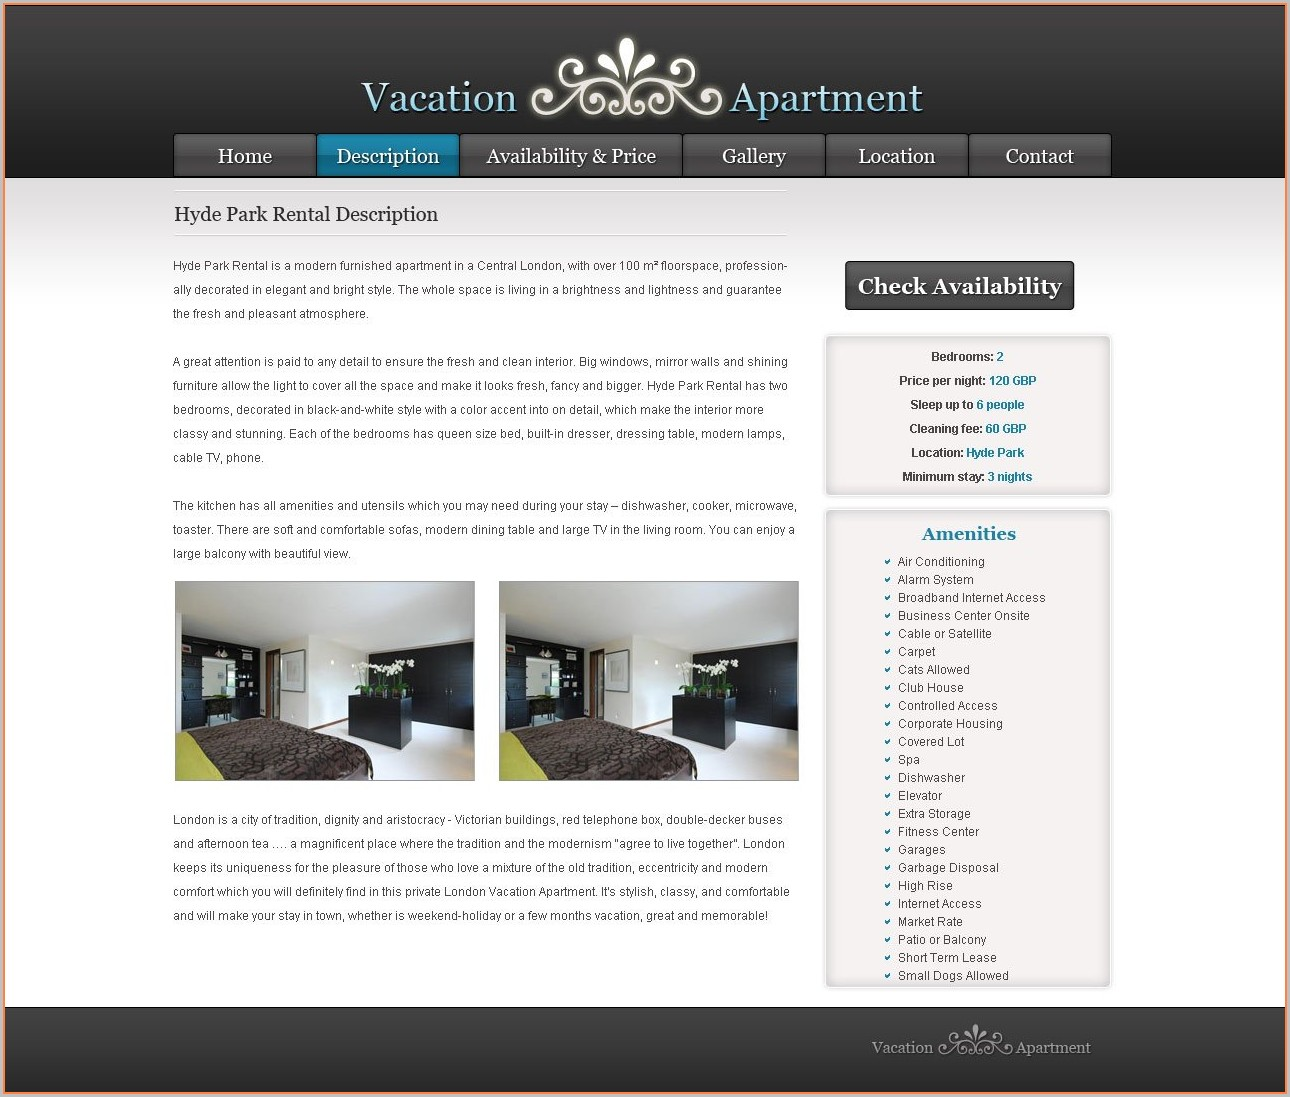 Vacation Rental Website Templates